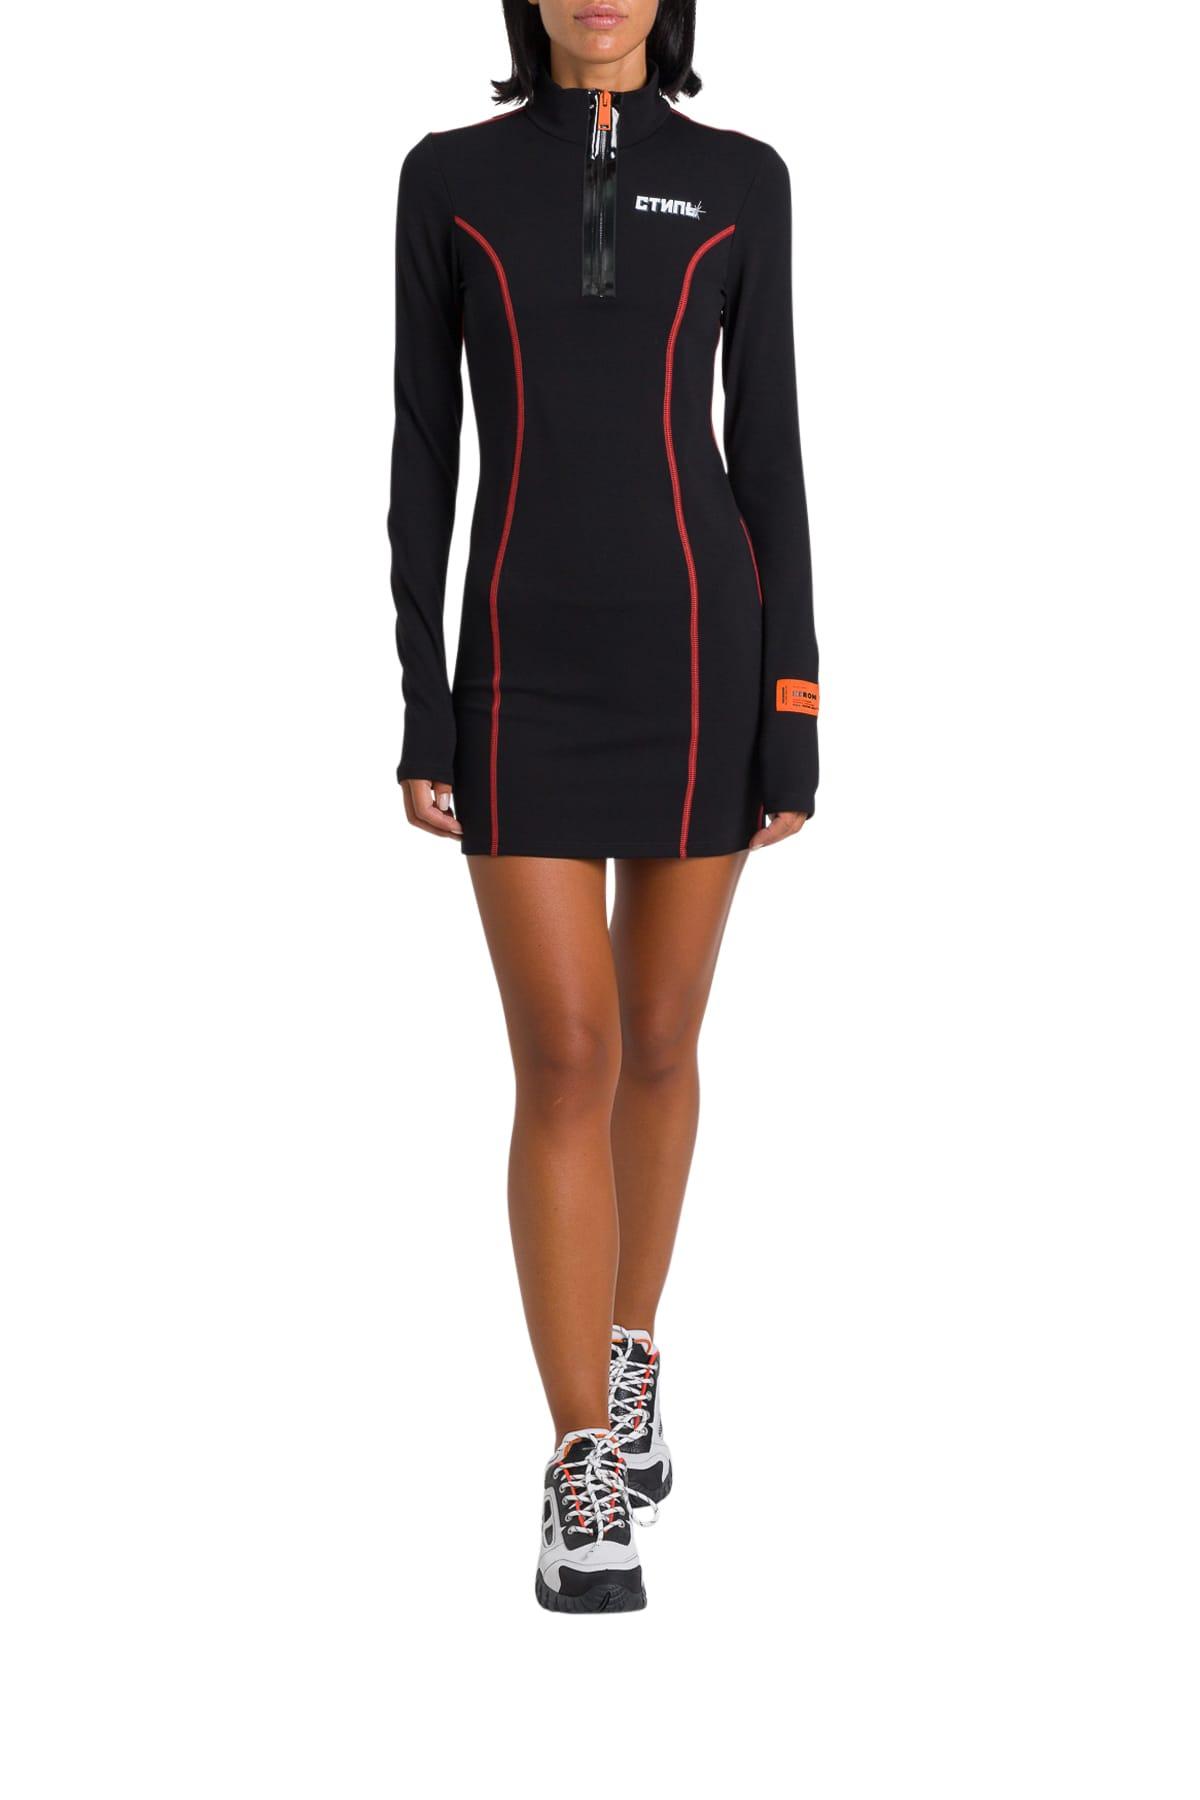 HERON PRESTON Ctnmb Active Short Dress